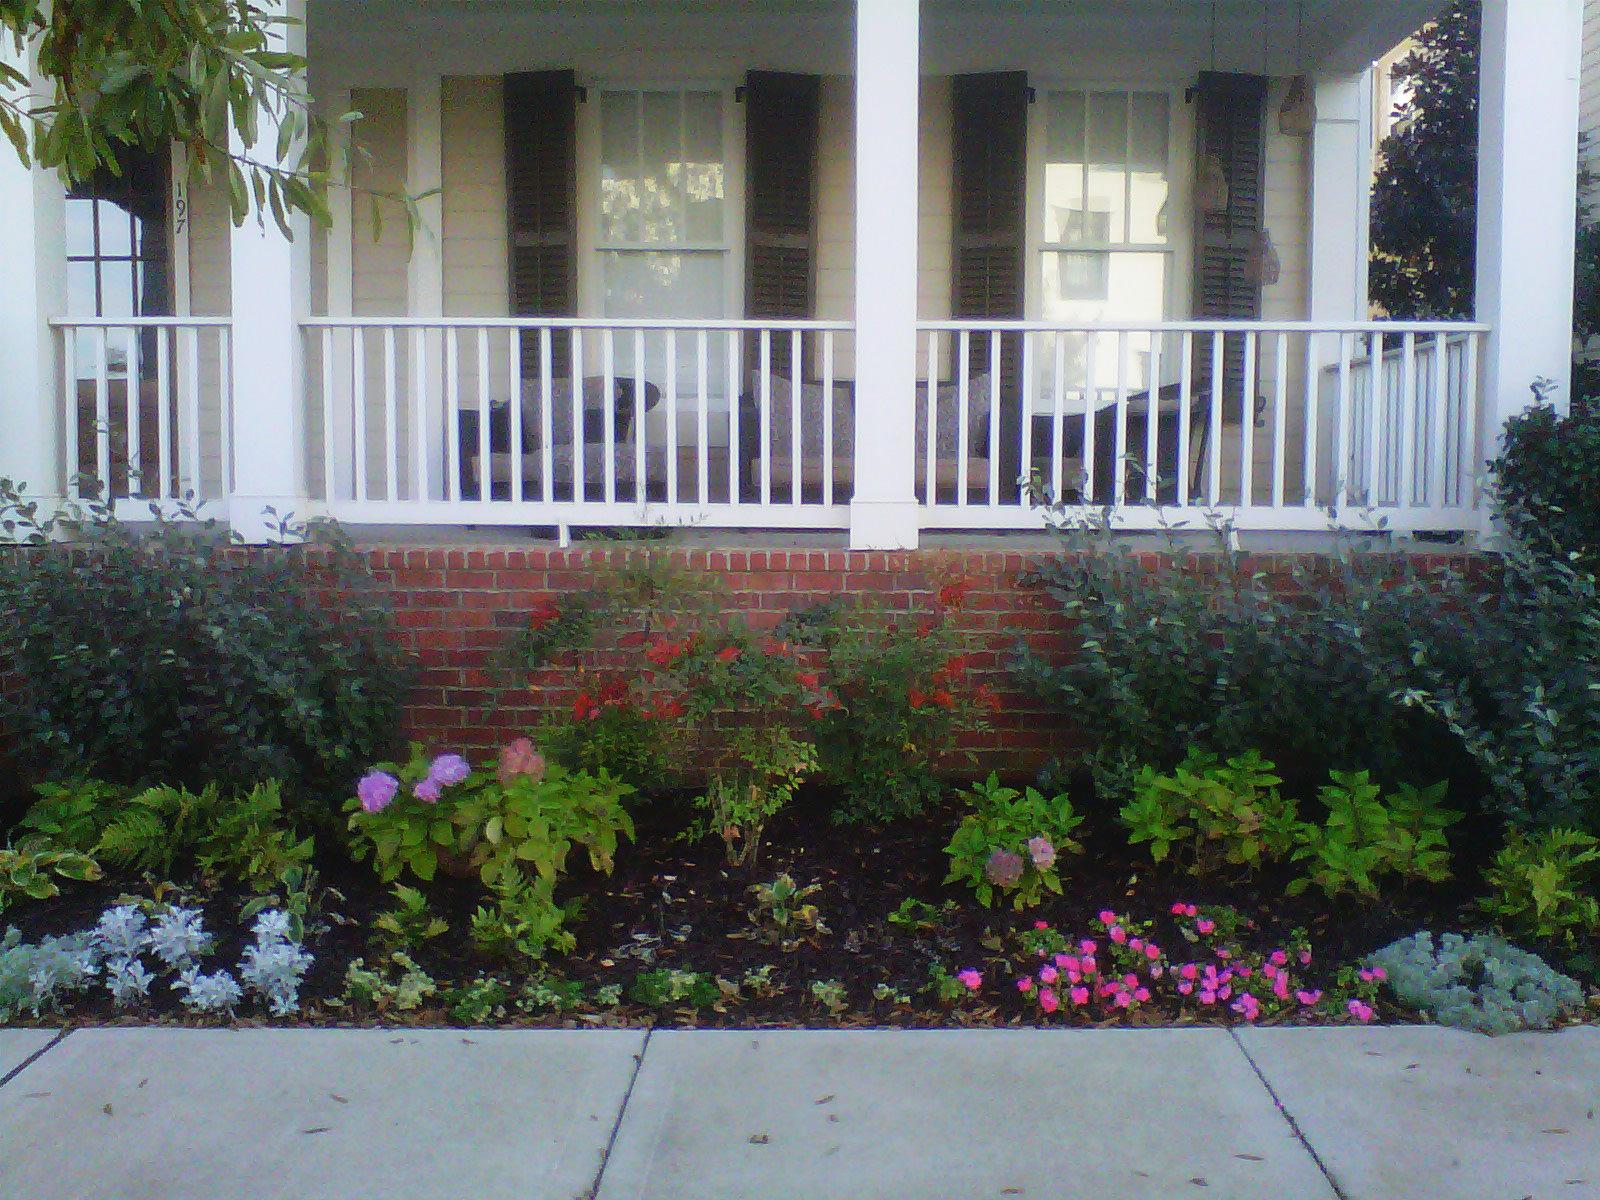 Justin Stelter Landscape Gardening - Modern Suburban Landscaping - 12591626605_83f7a809f5_o.jpg